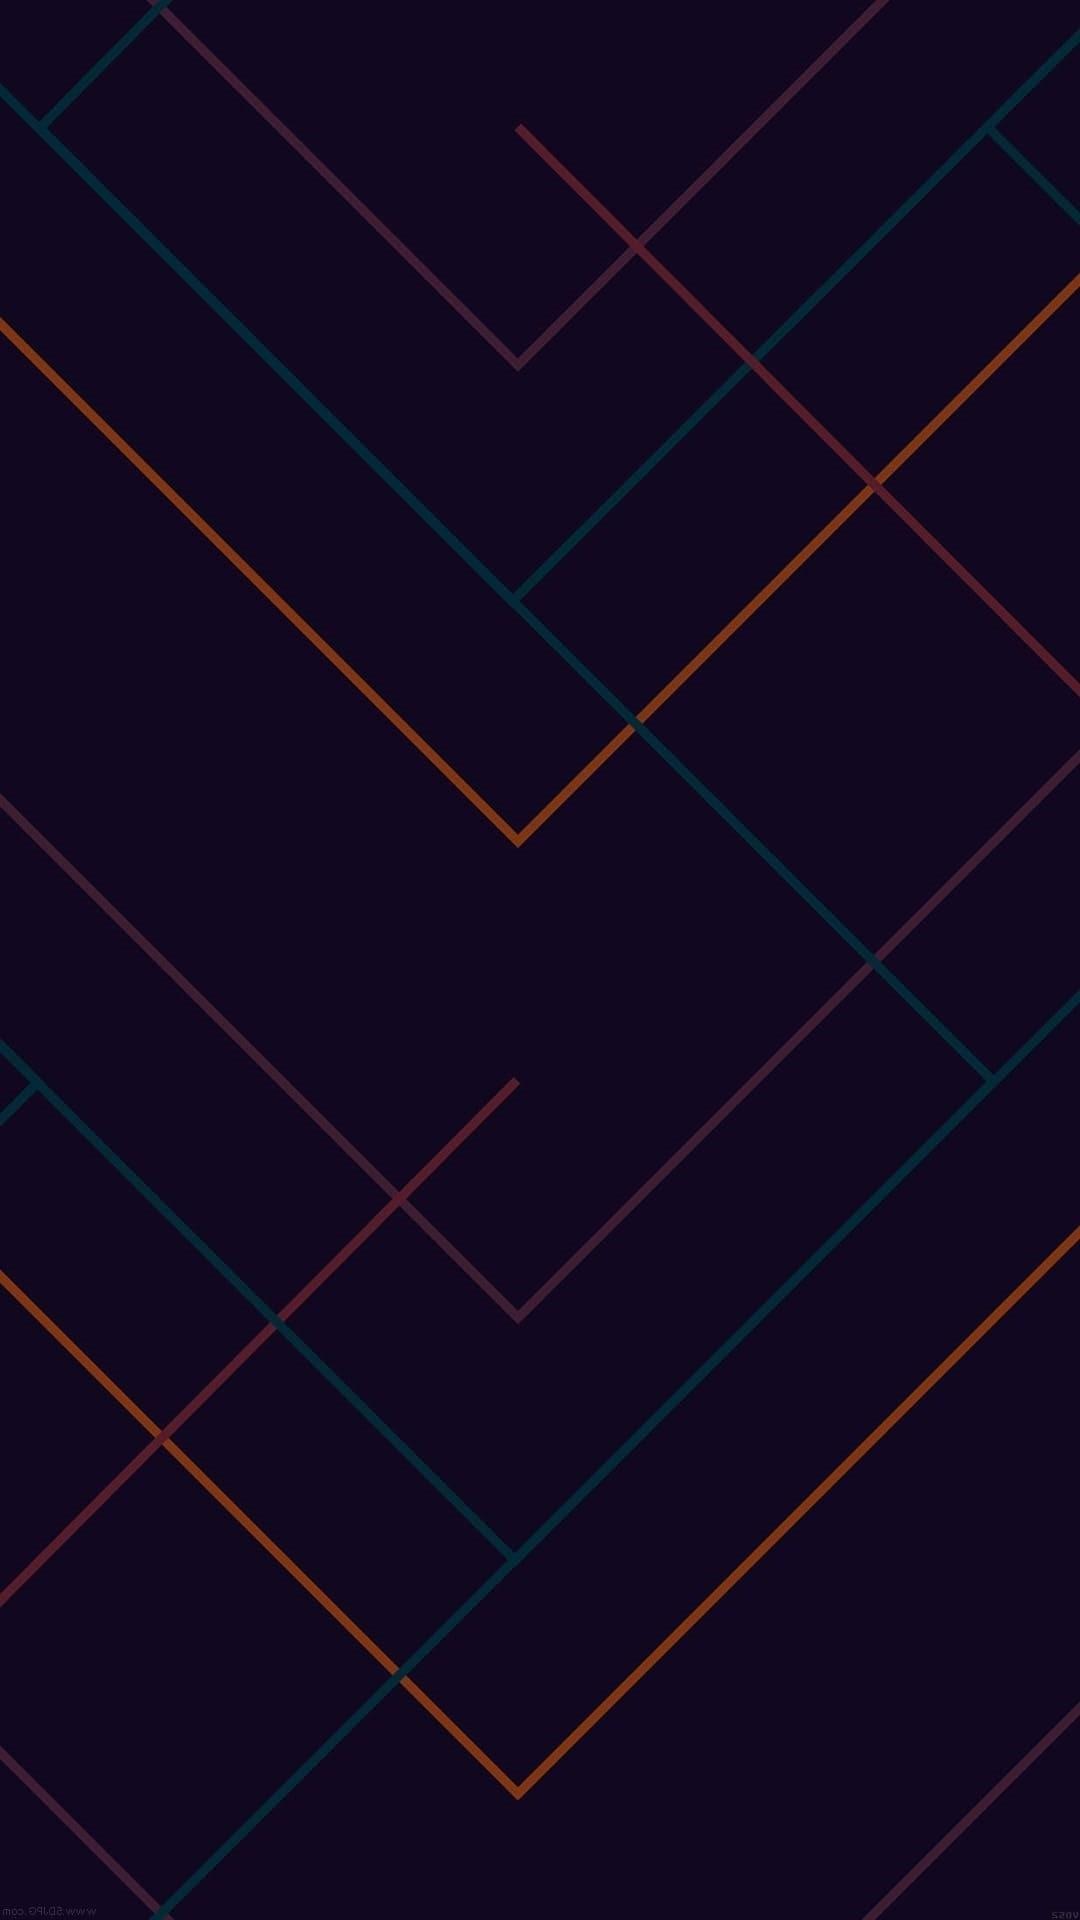 Simple iPhone wallpaper